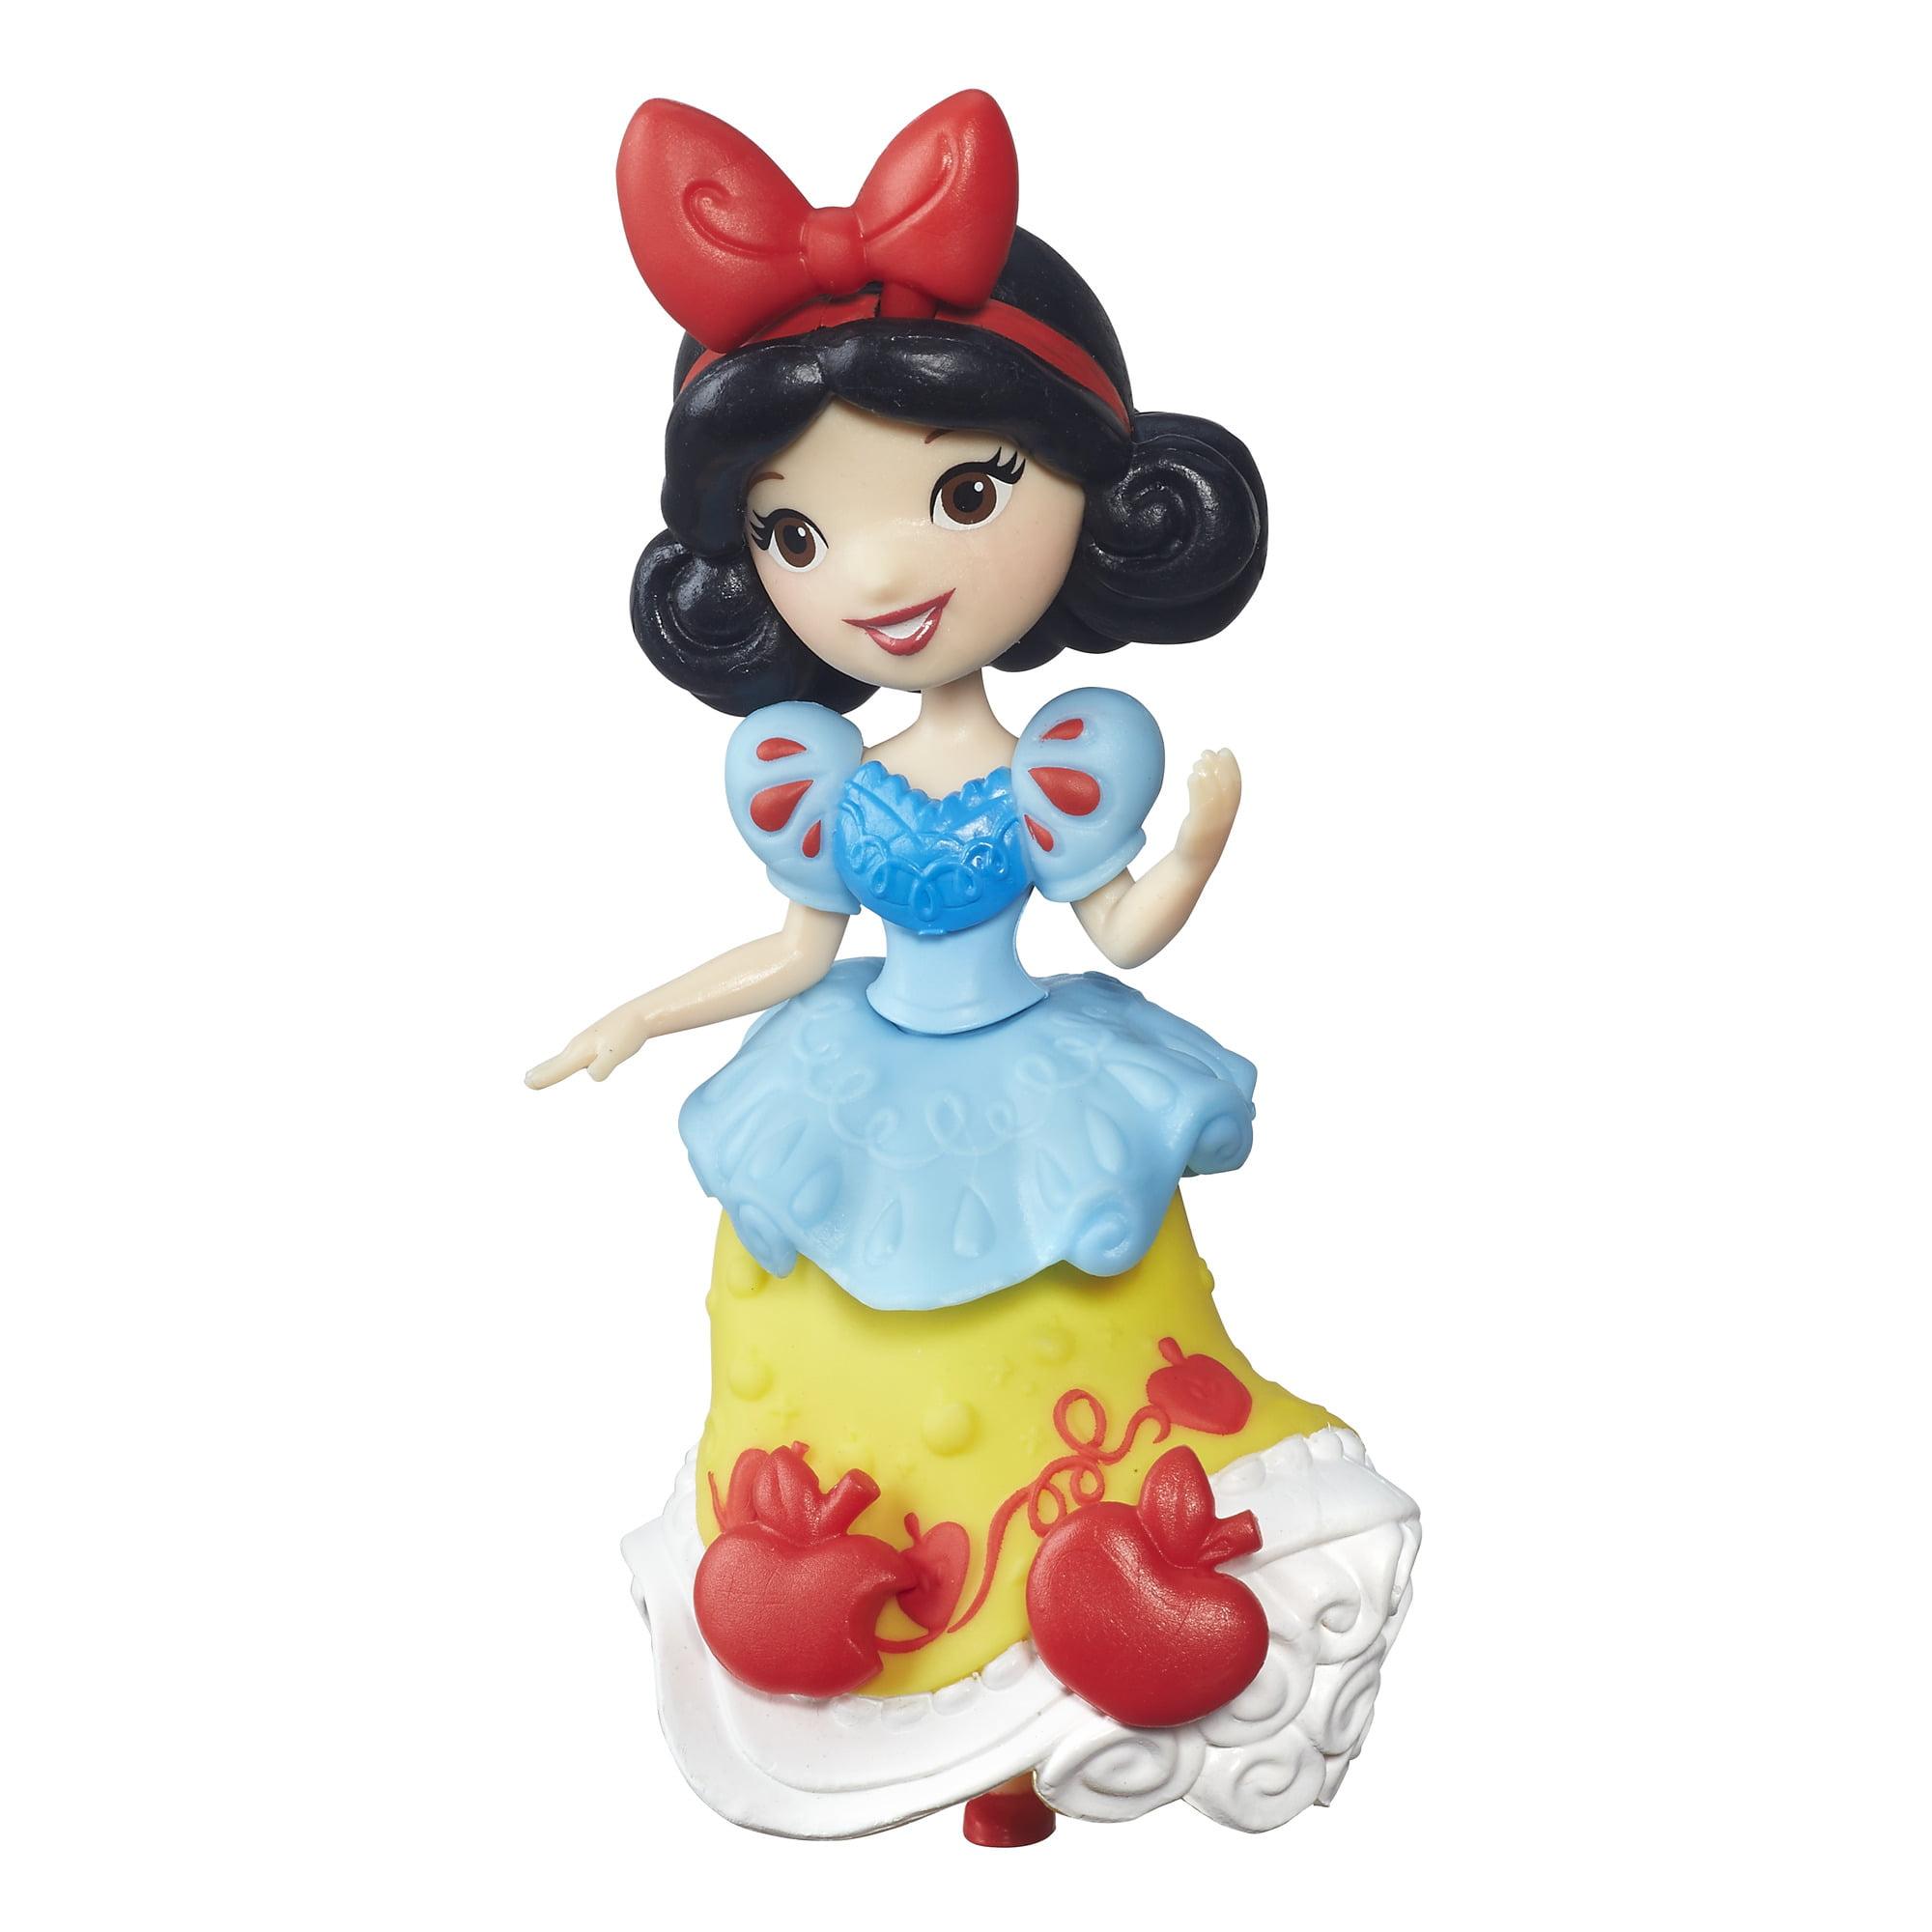 Disney Princess Little Kingdom Classic Snow White